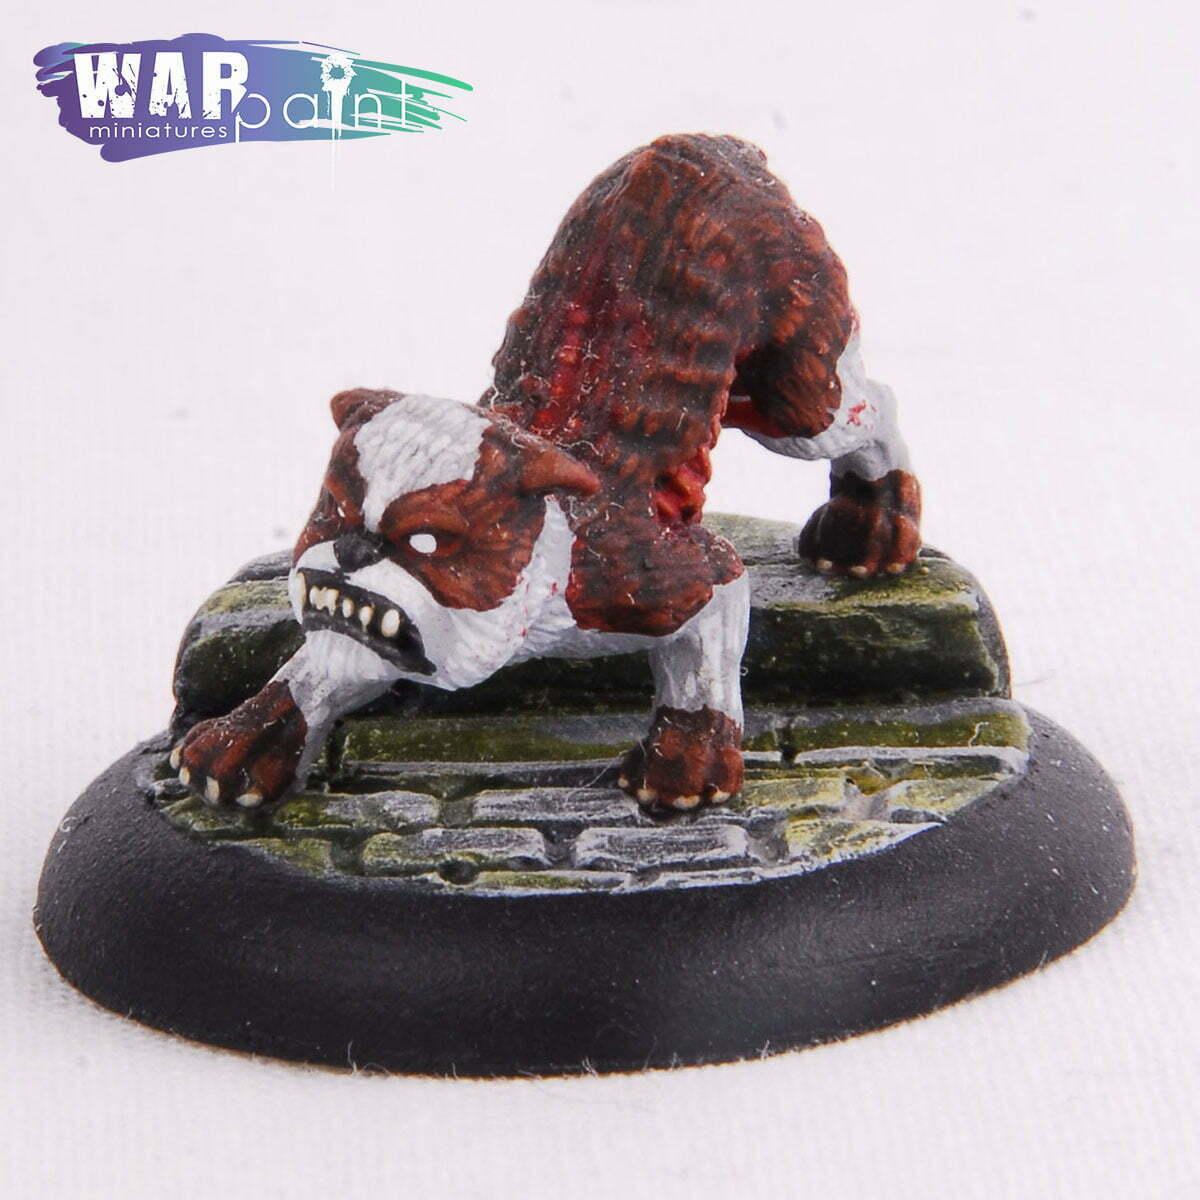 Canine-Remains-Malifuax